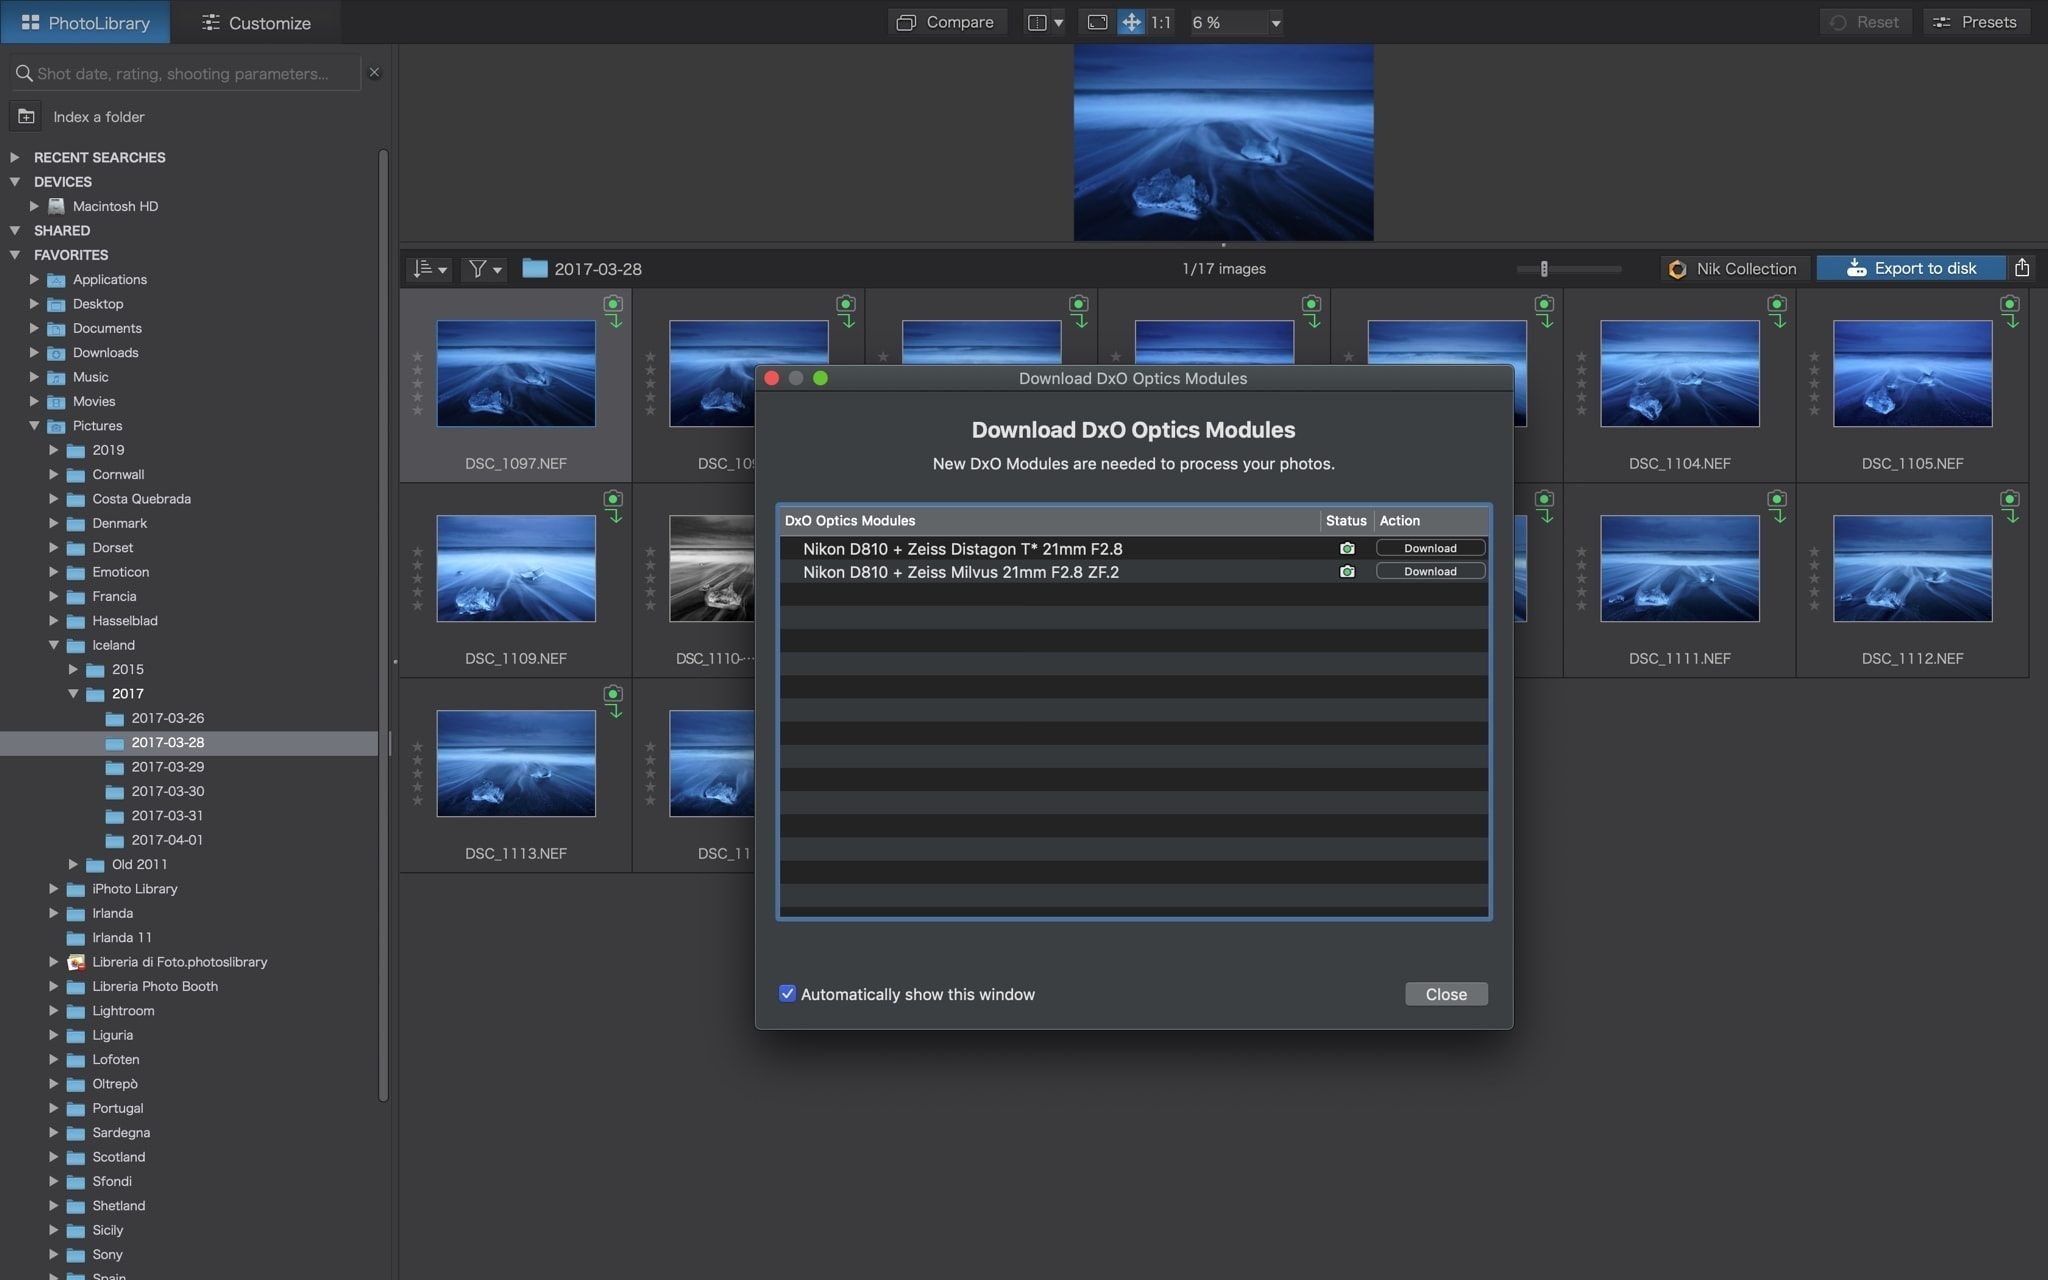 PhotoLab 3optical modules francesco gola review